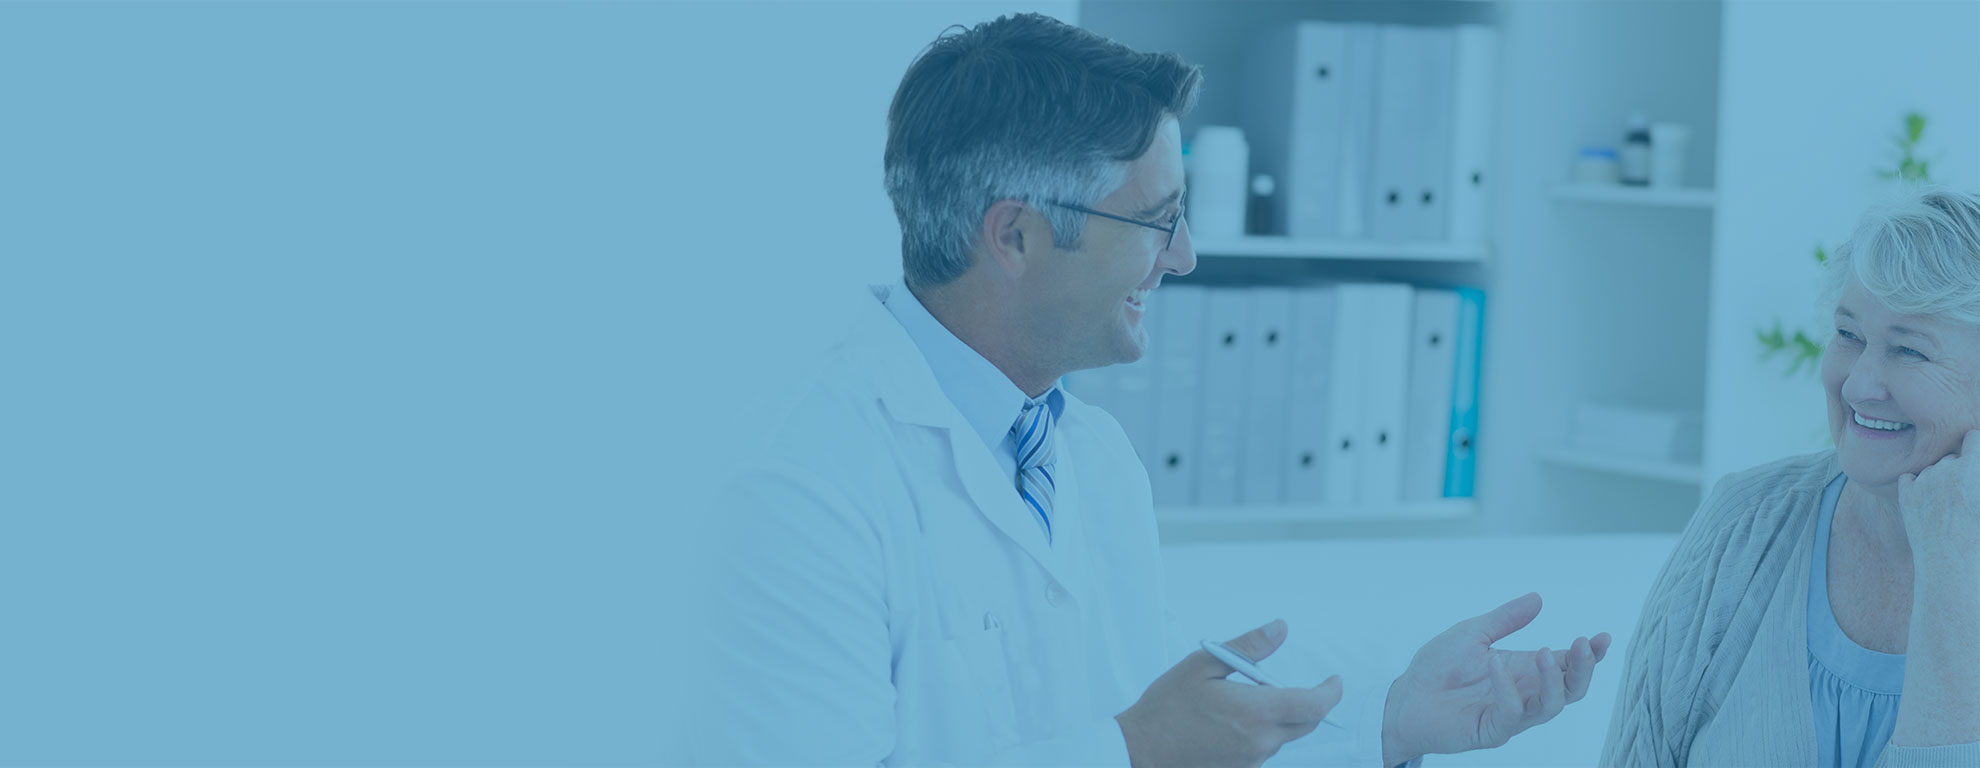 Pancreatic Cancer Replace - Boston Scientific